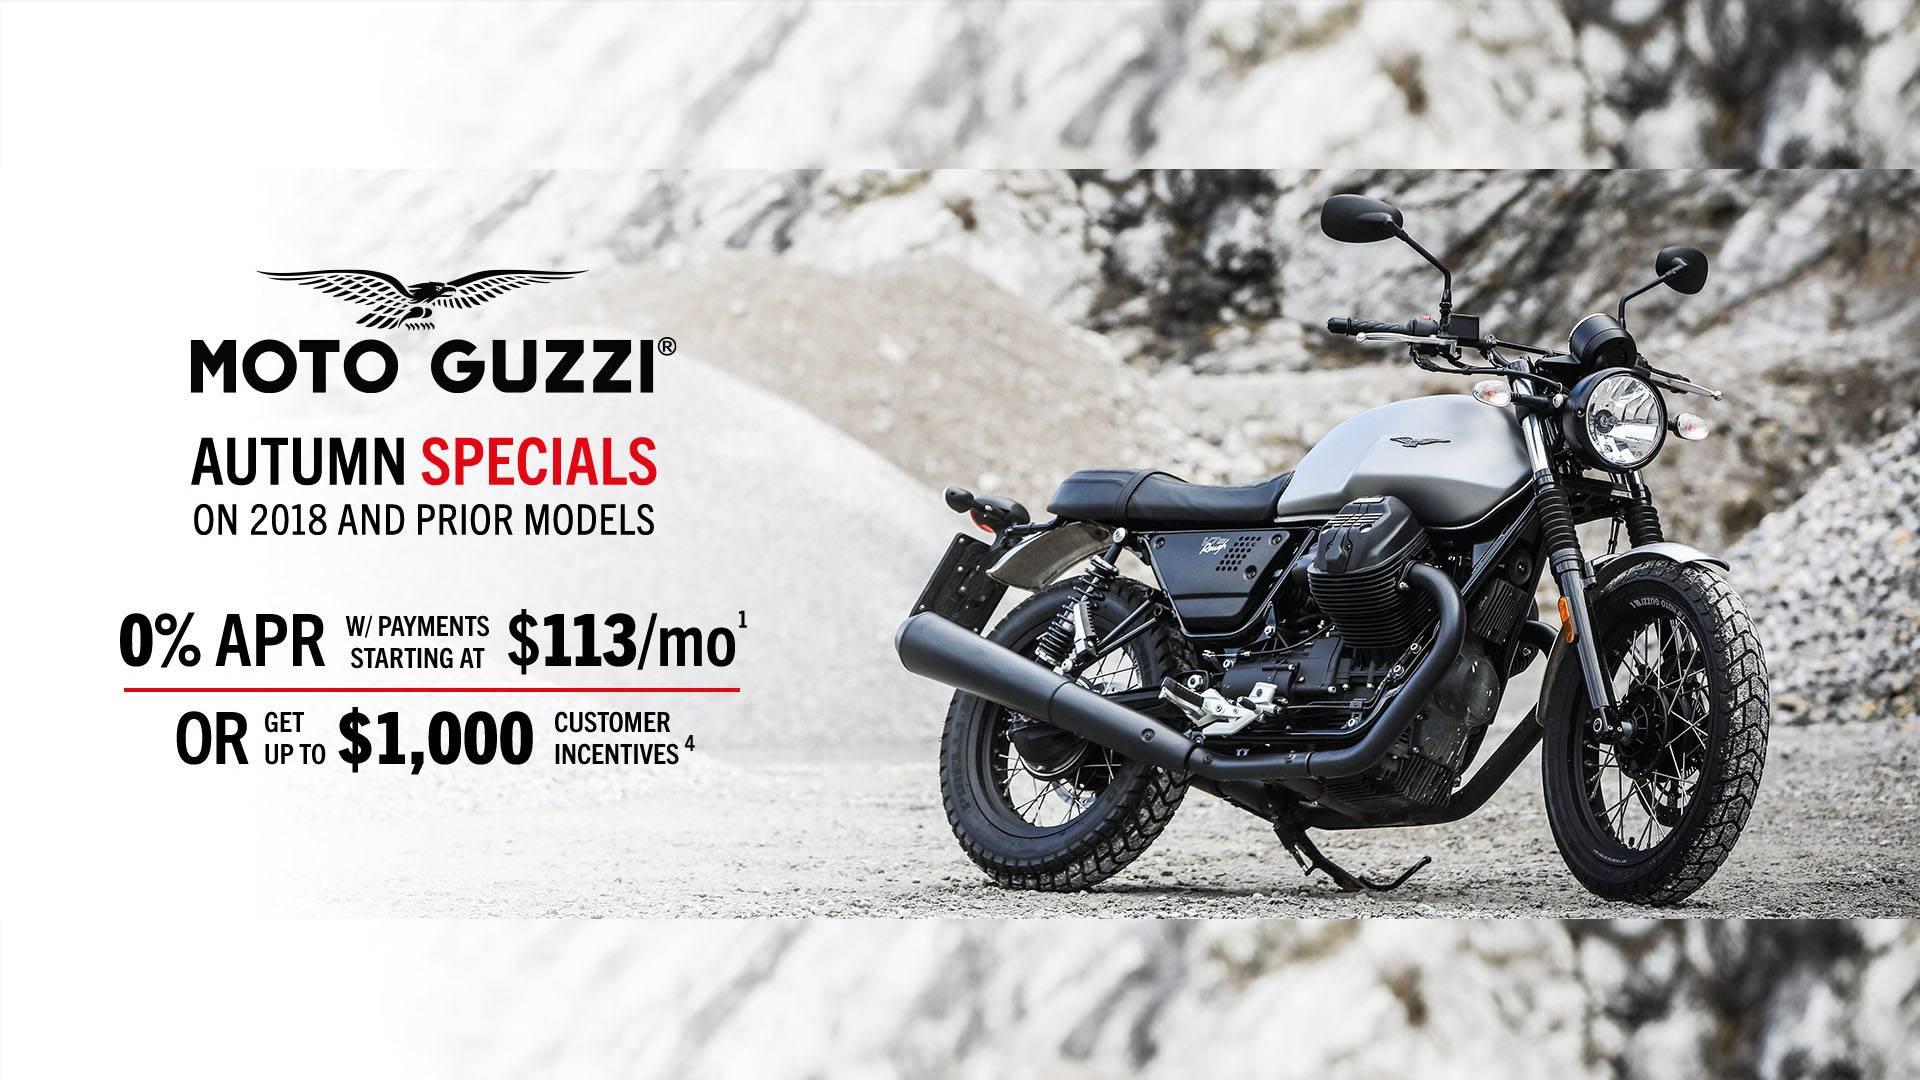 Moto Guzzi - Autumn Specials - 2018 and Prior Models